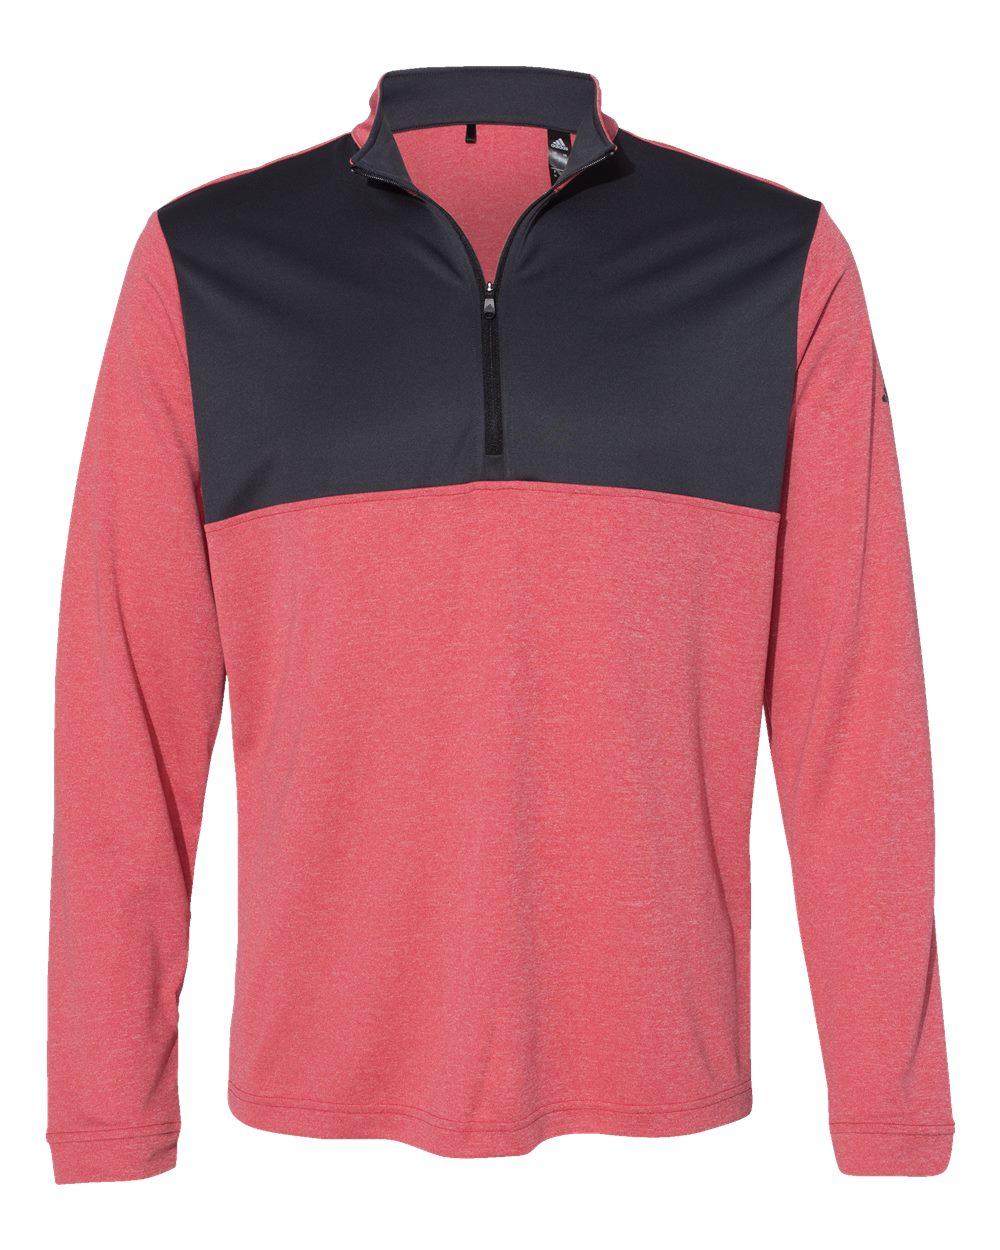 Adidas-Mens-Lightweight-UPF-pullover-Shirt-Warmup-A280-up-to-4XL thumbnail 18